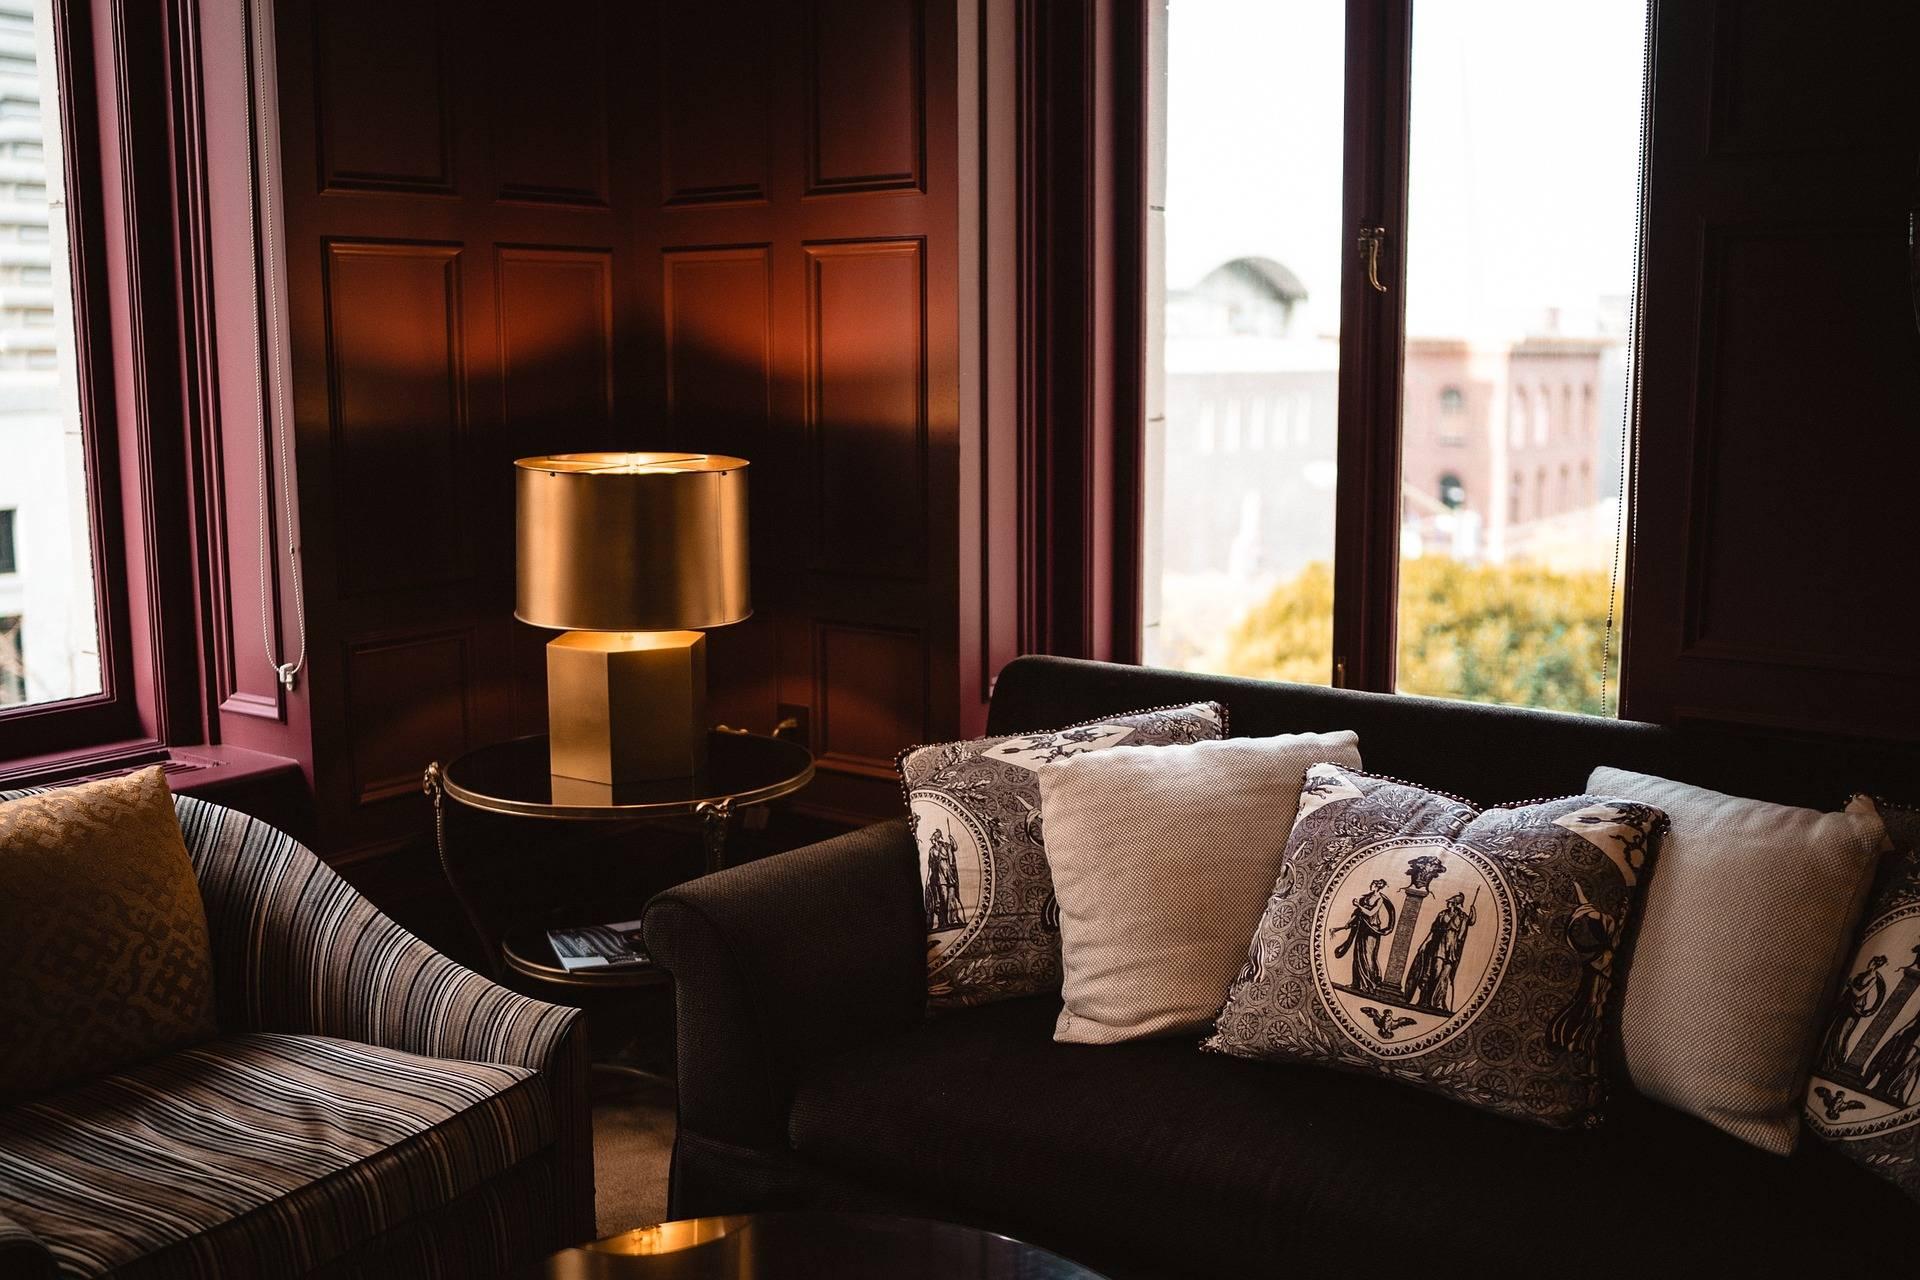 mobilier moderne chic et design nice hotel france sud h tel de la c te d 39 azur dans le sud. Black Bedroom Furniture Sets. Home Design Ideas